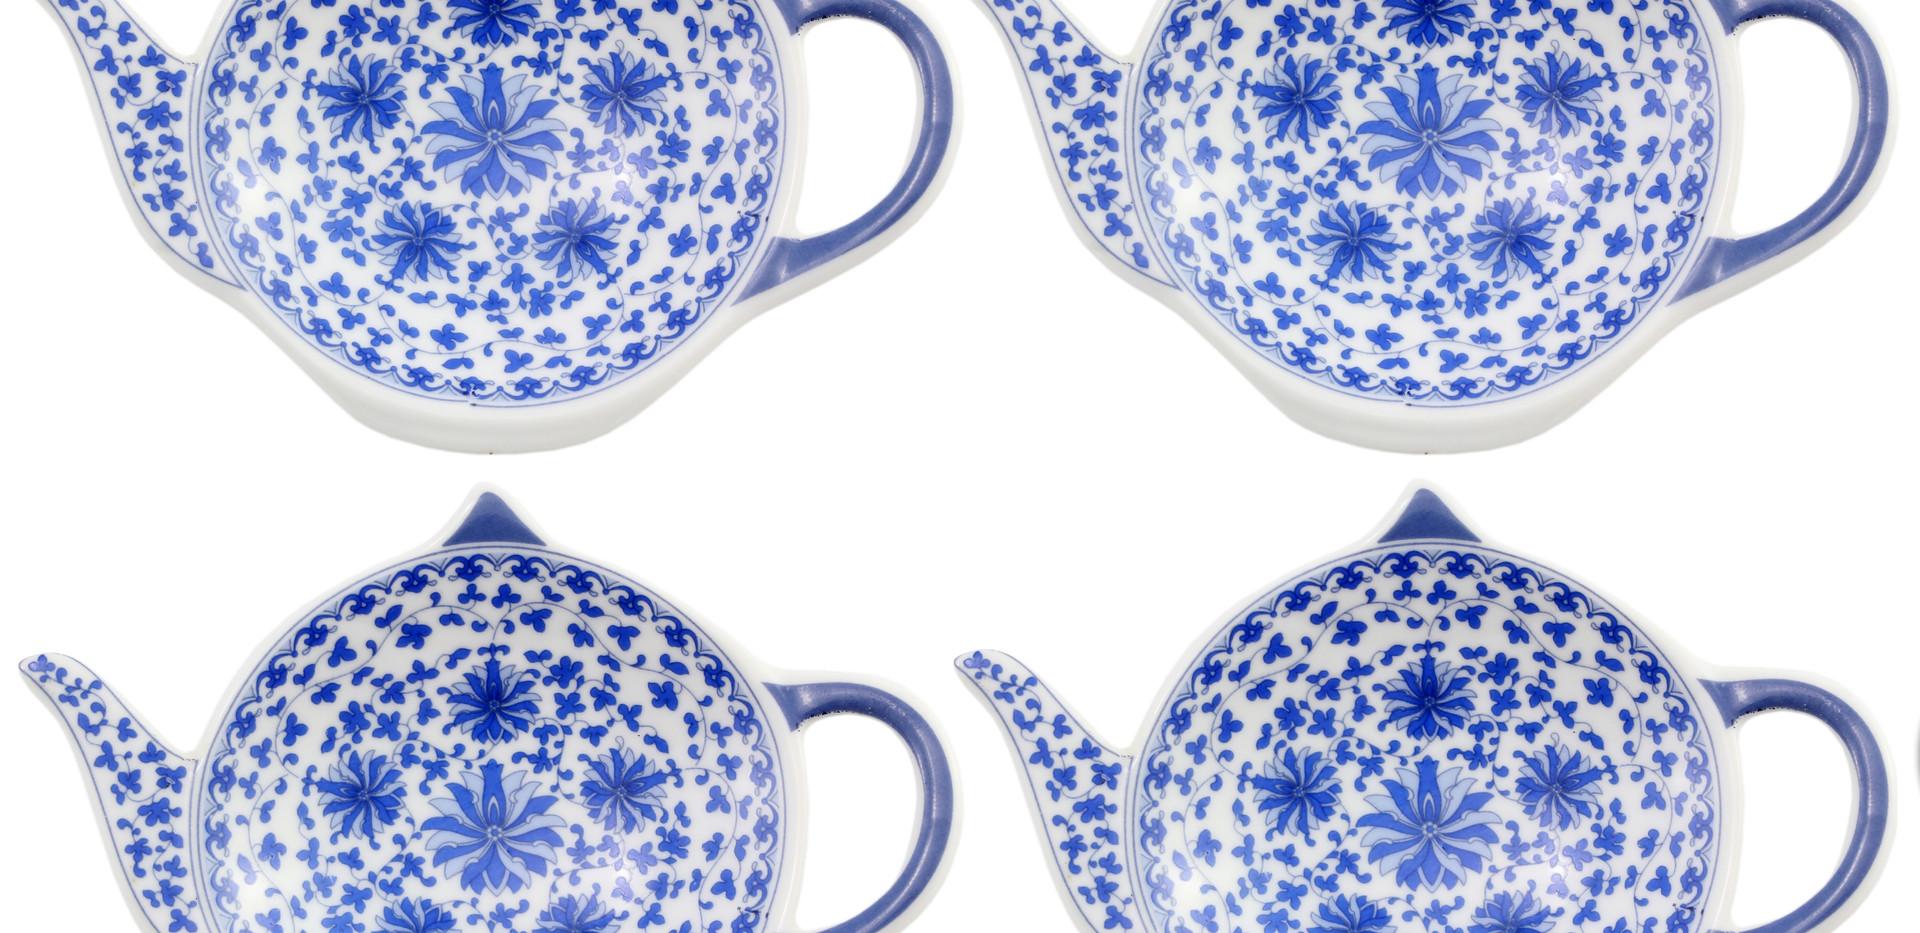 B01LOSCMA2 - 4-Pack of Blue & White Teap